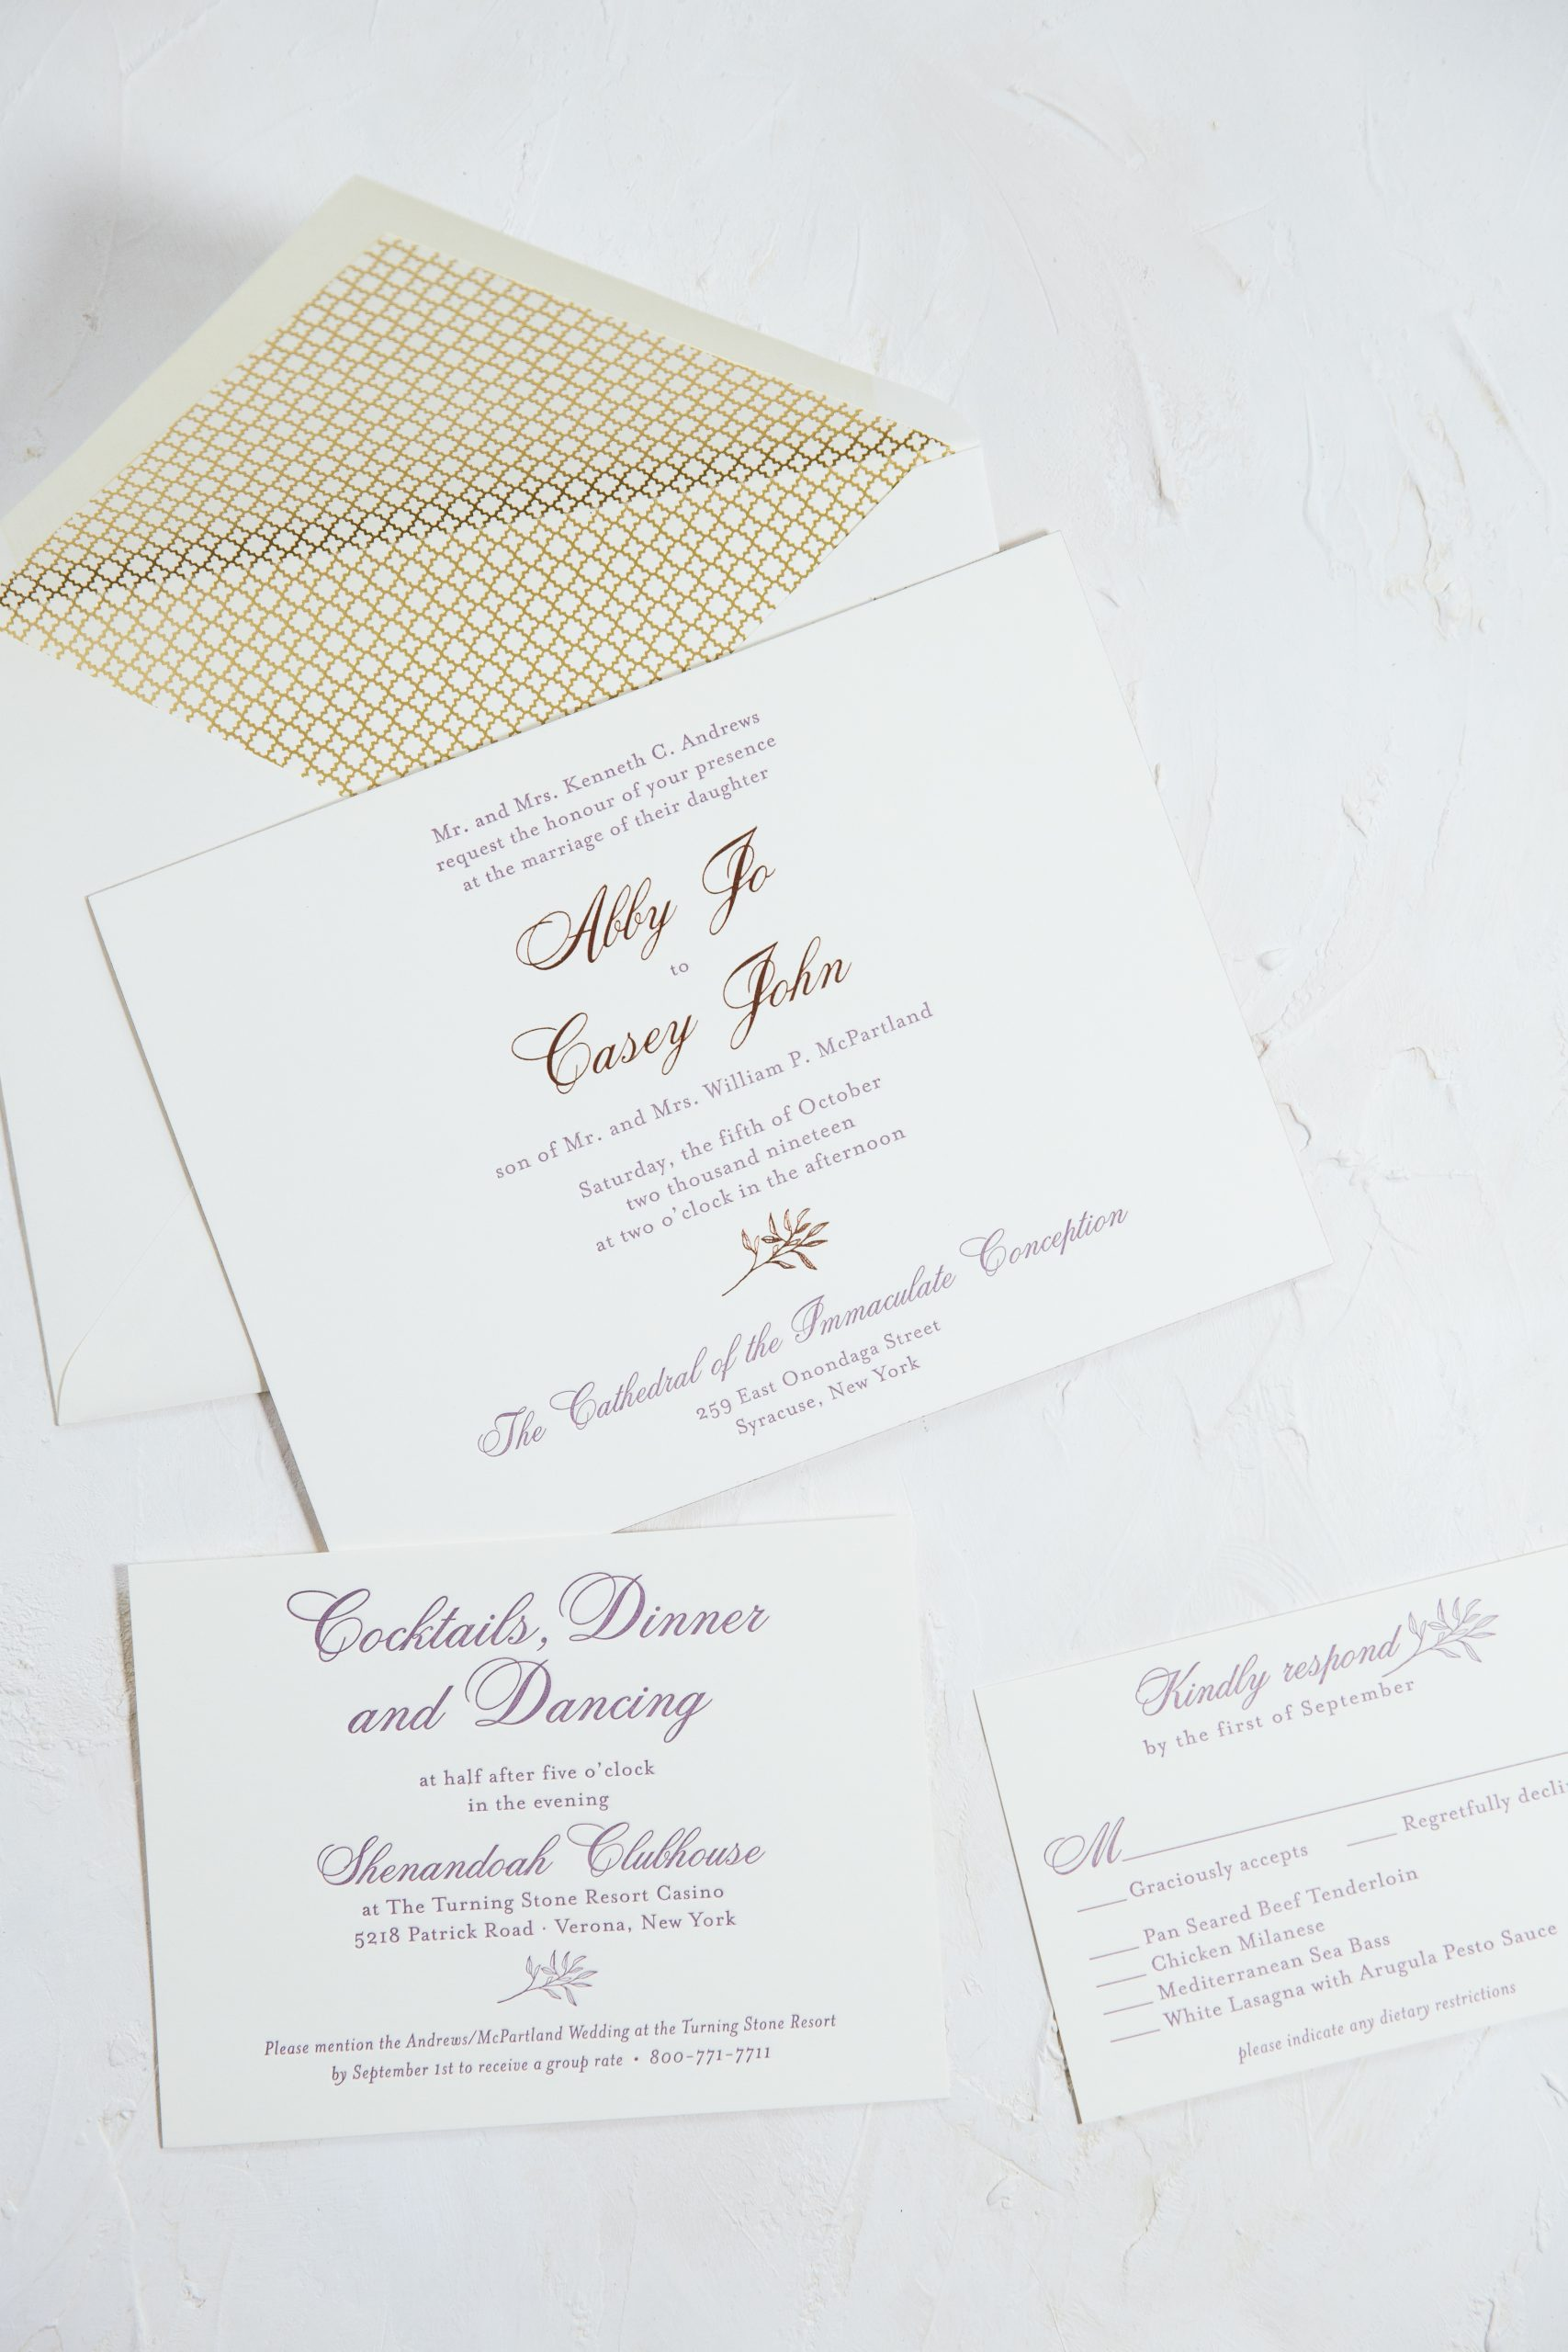 Purple letterpress invitations